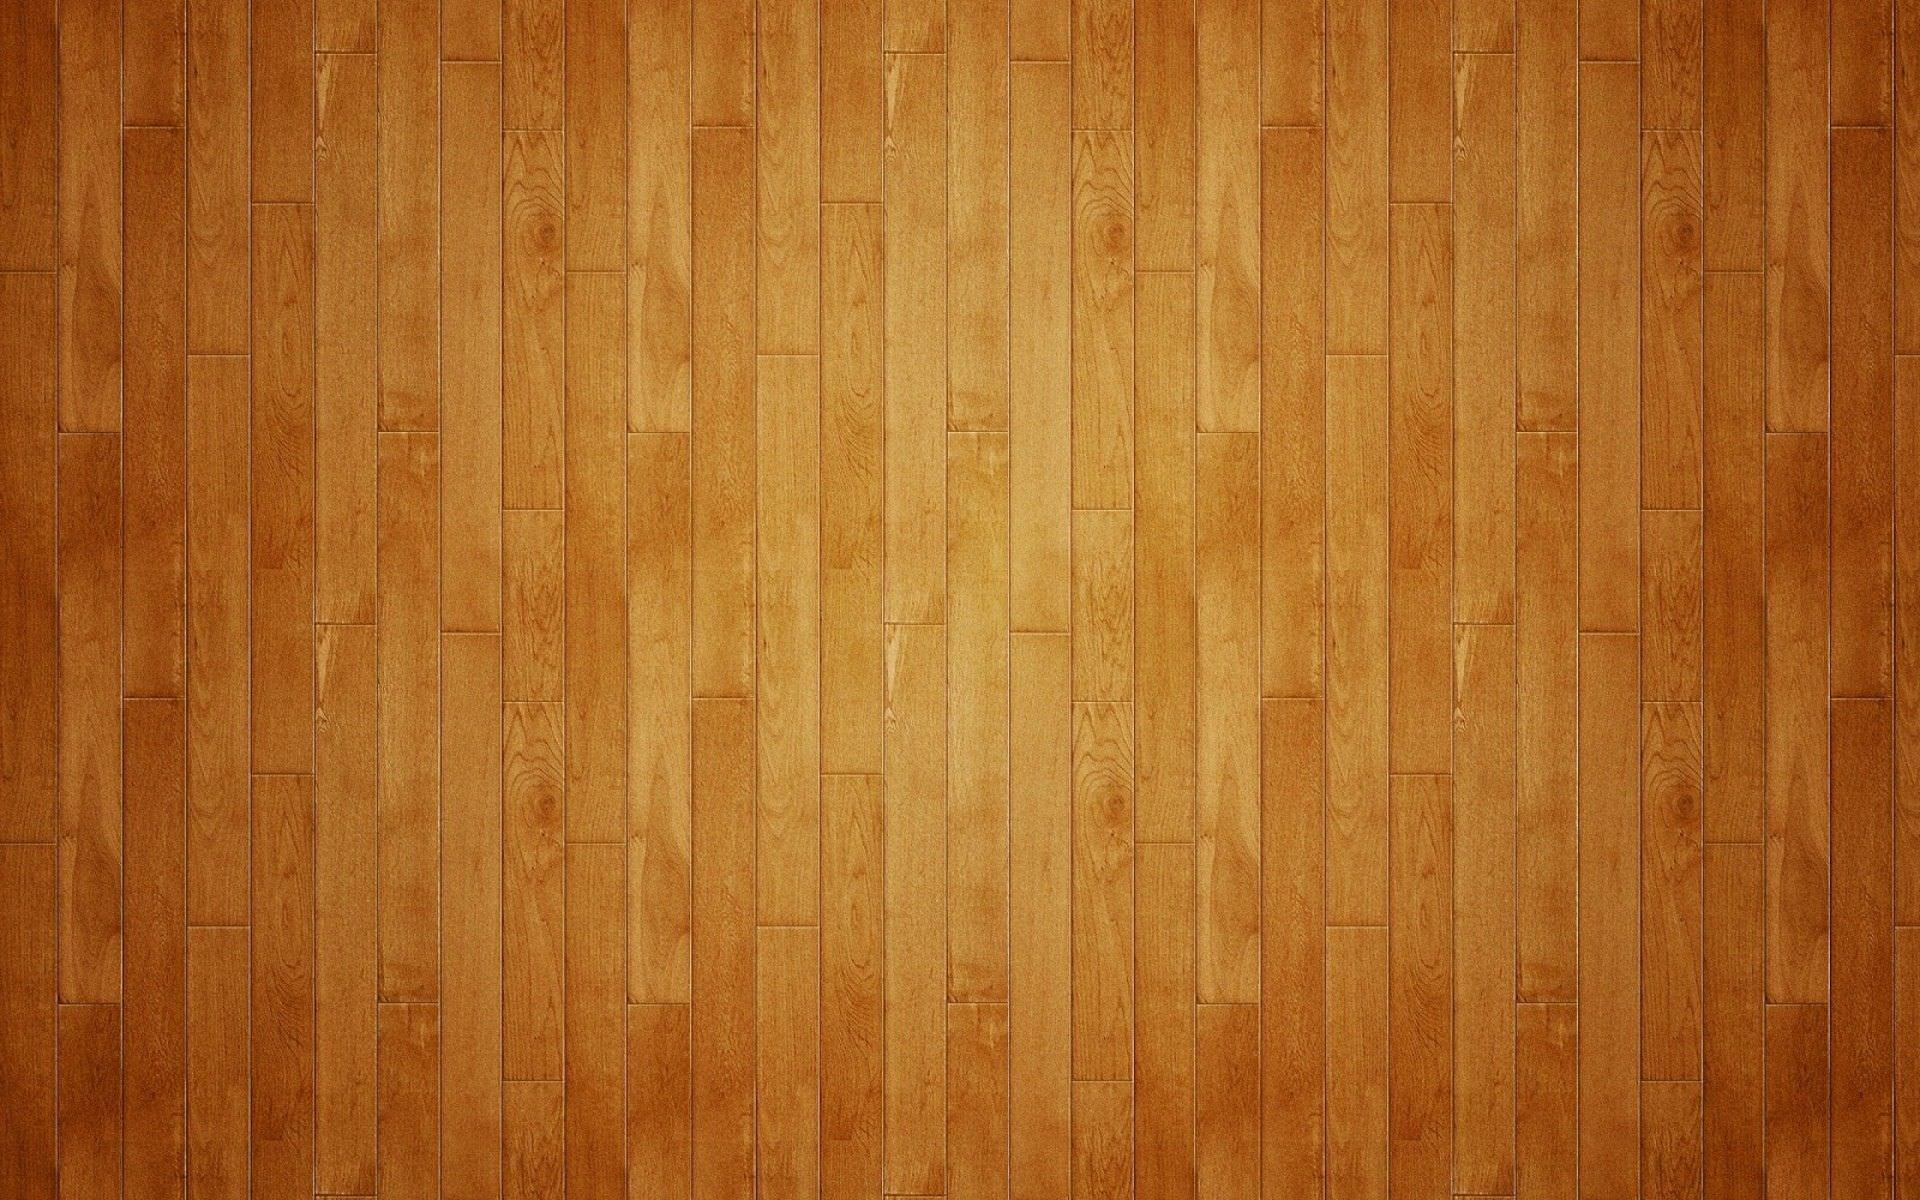 Wood Texture Wallpaper Background